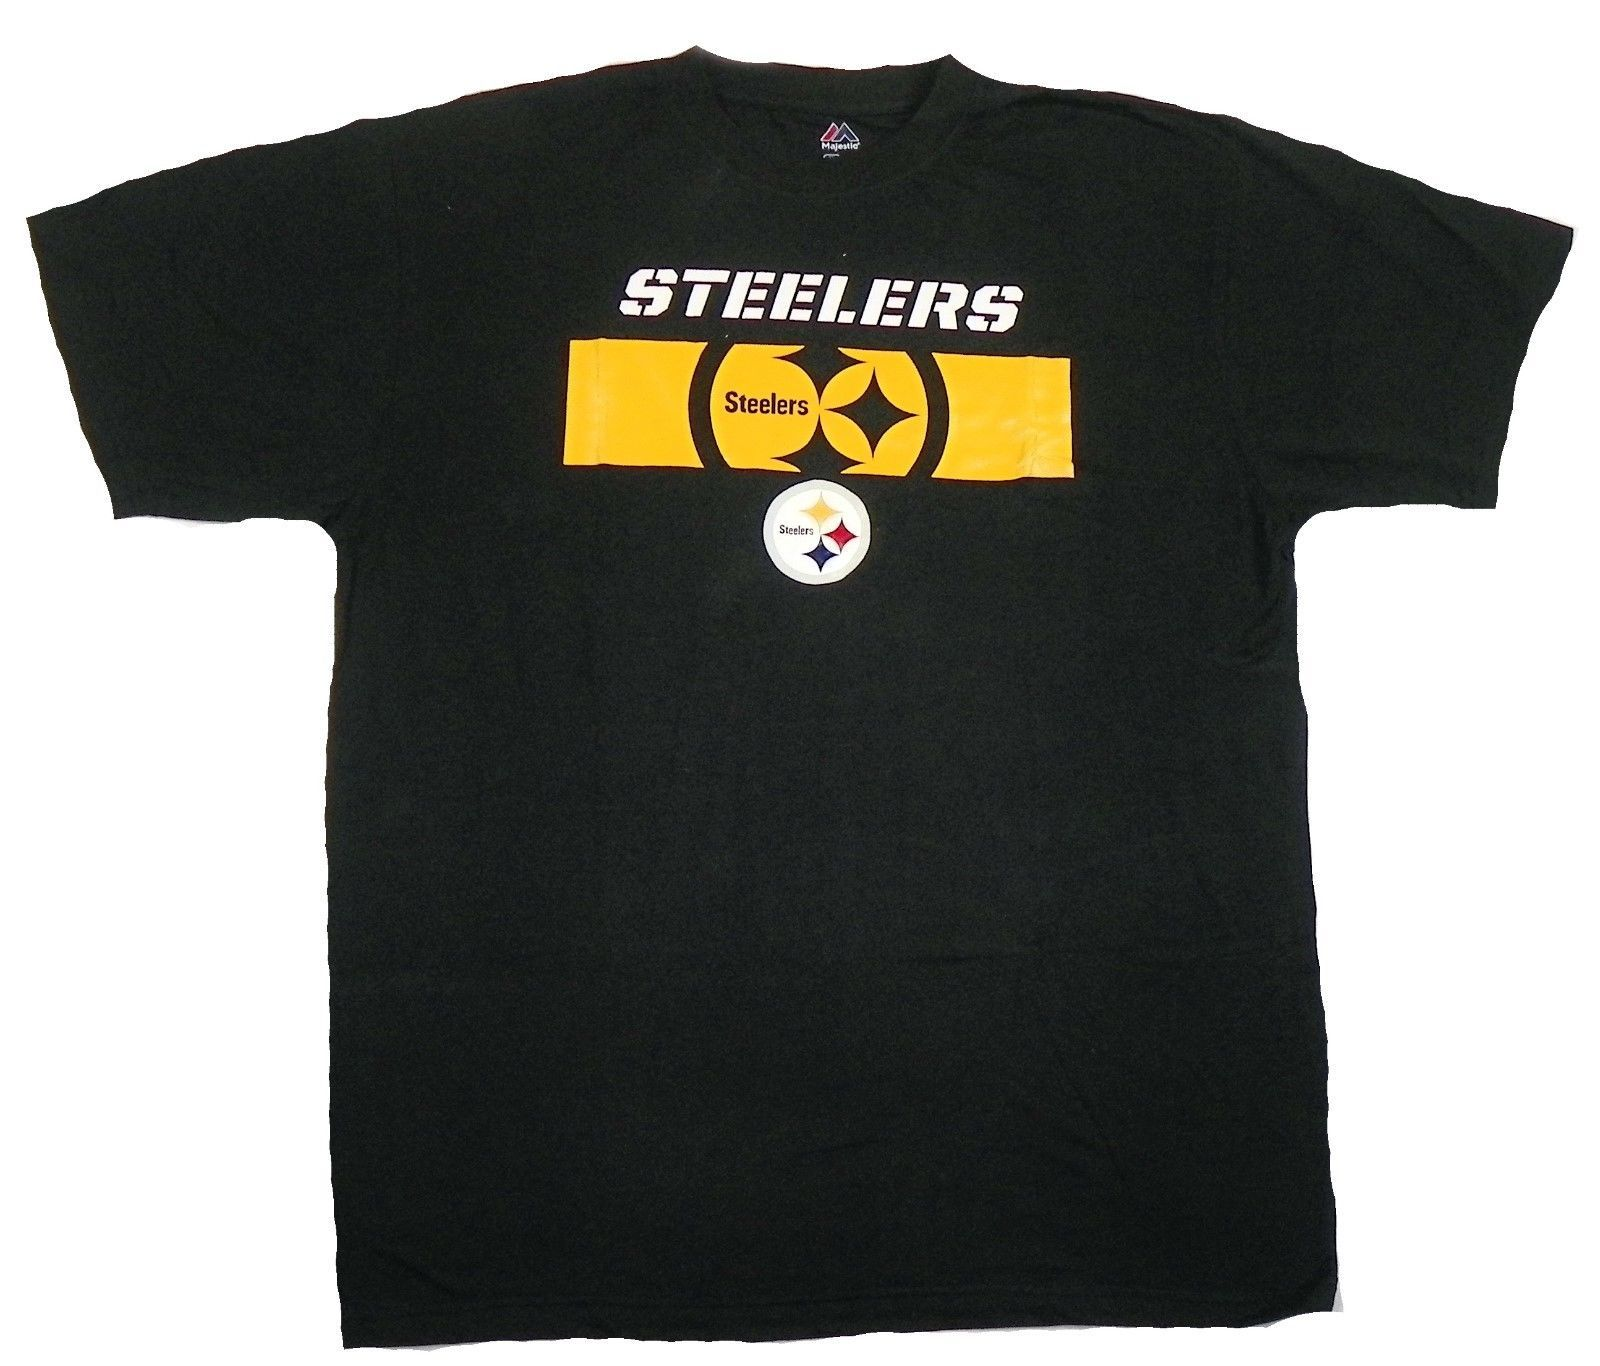 Pittsburgh Steelers Shirt Men's NFL Yardage Crew Tee Short Sleeve Big T-Shirt